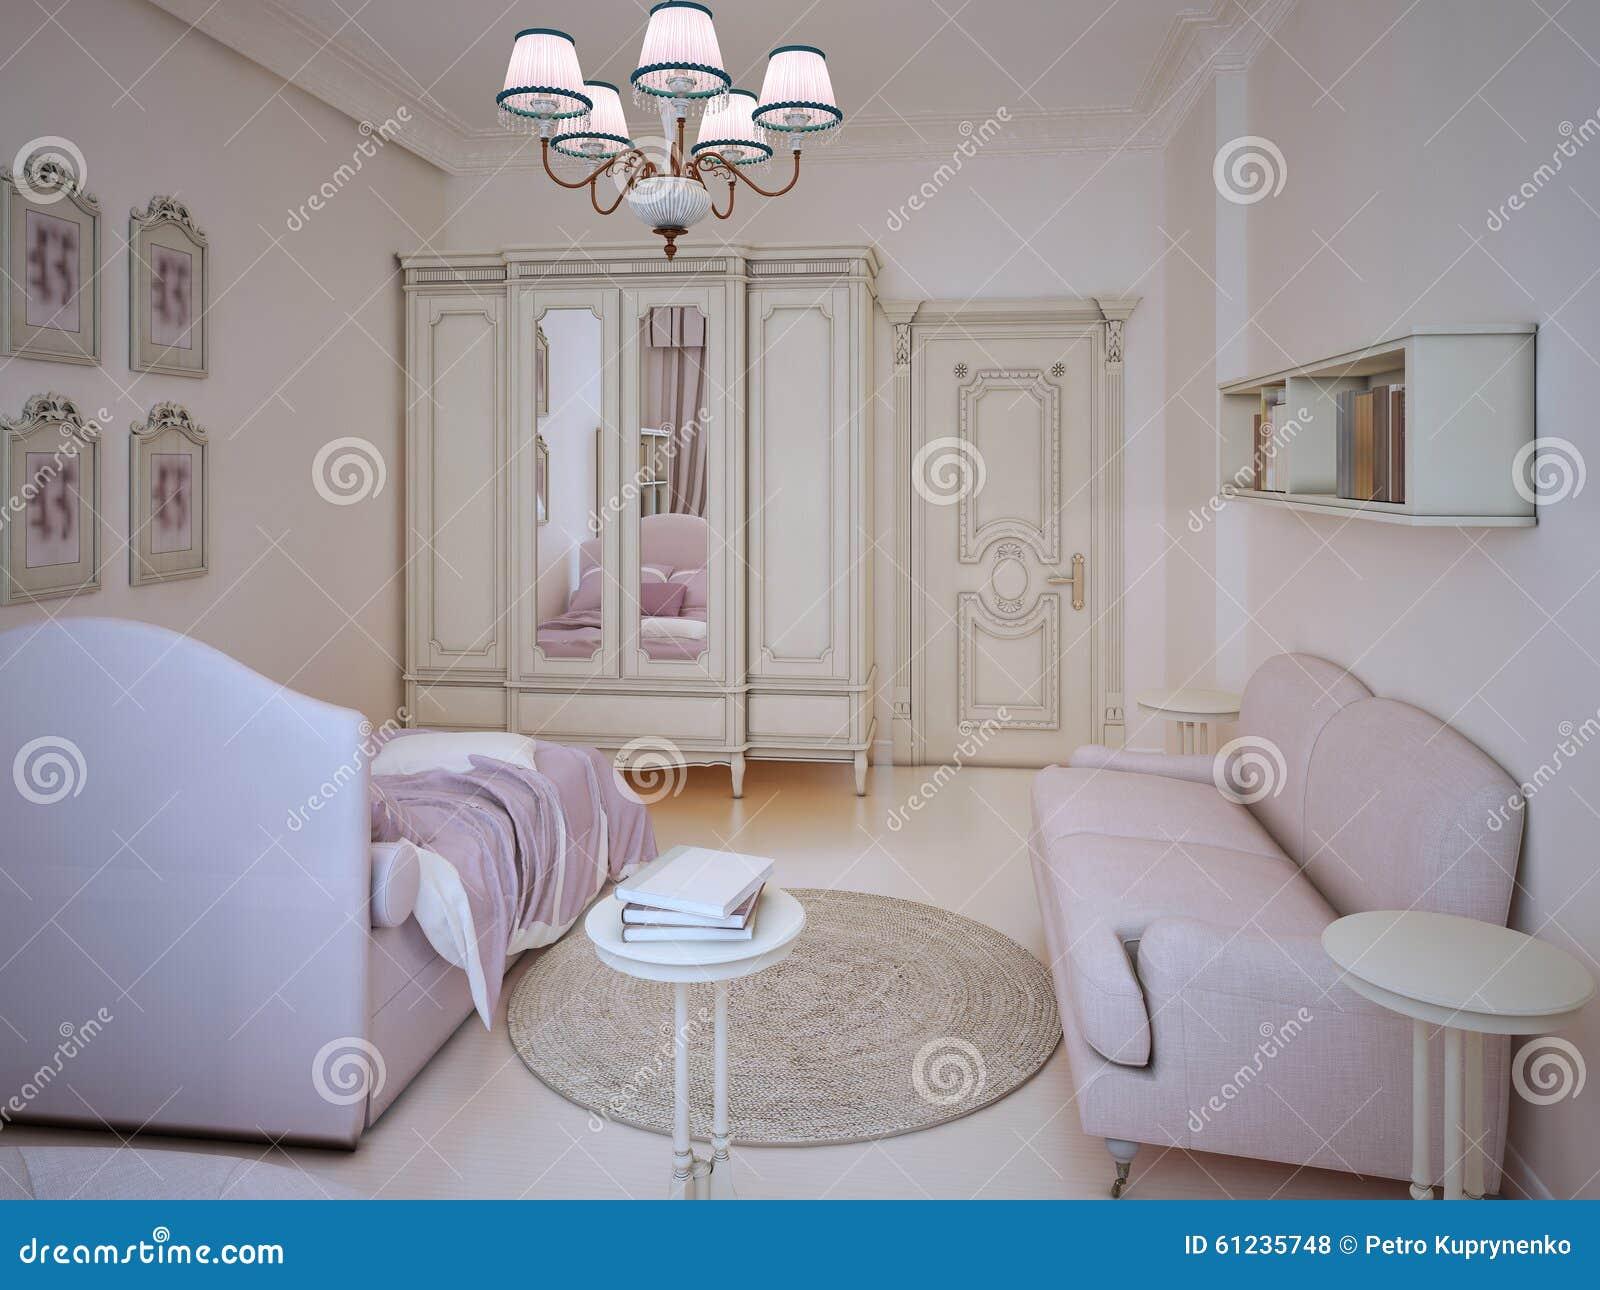 classic teenager girl bedroom stock illustration illustration of rh dreamstime com